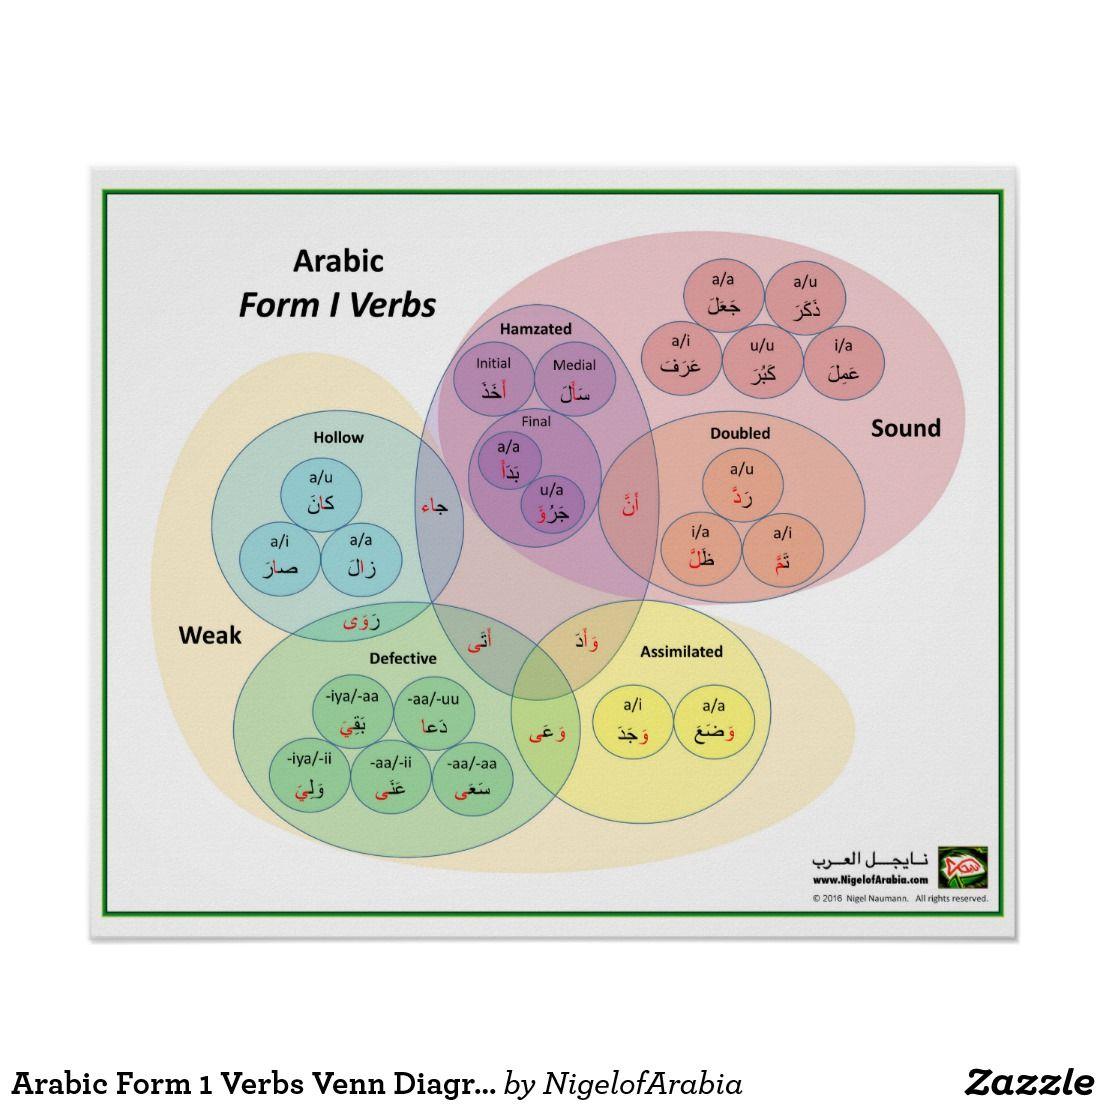 Arabic Form 1 Verbs Venn Diagram Poster | Pinterest